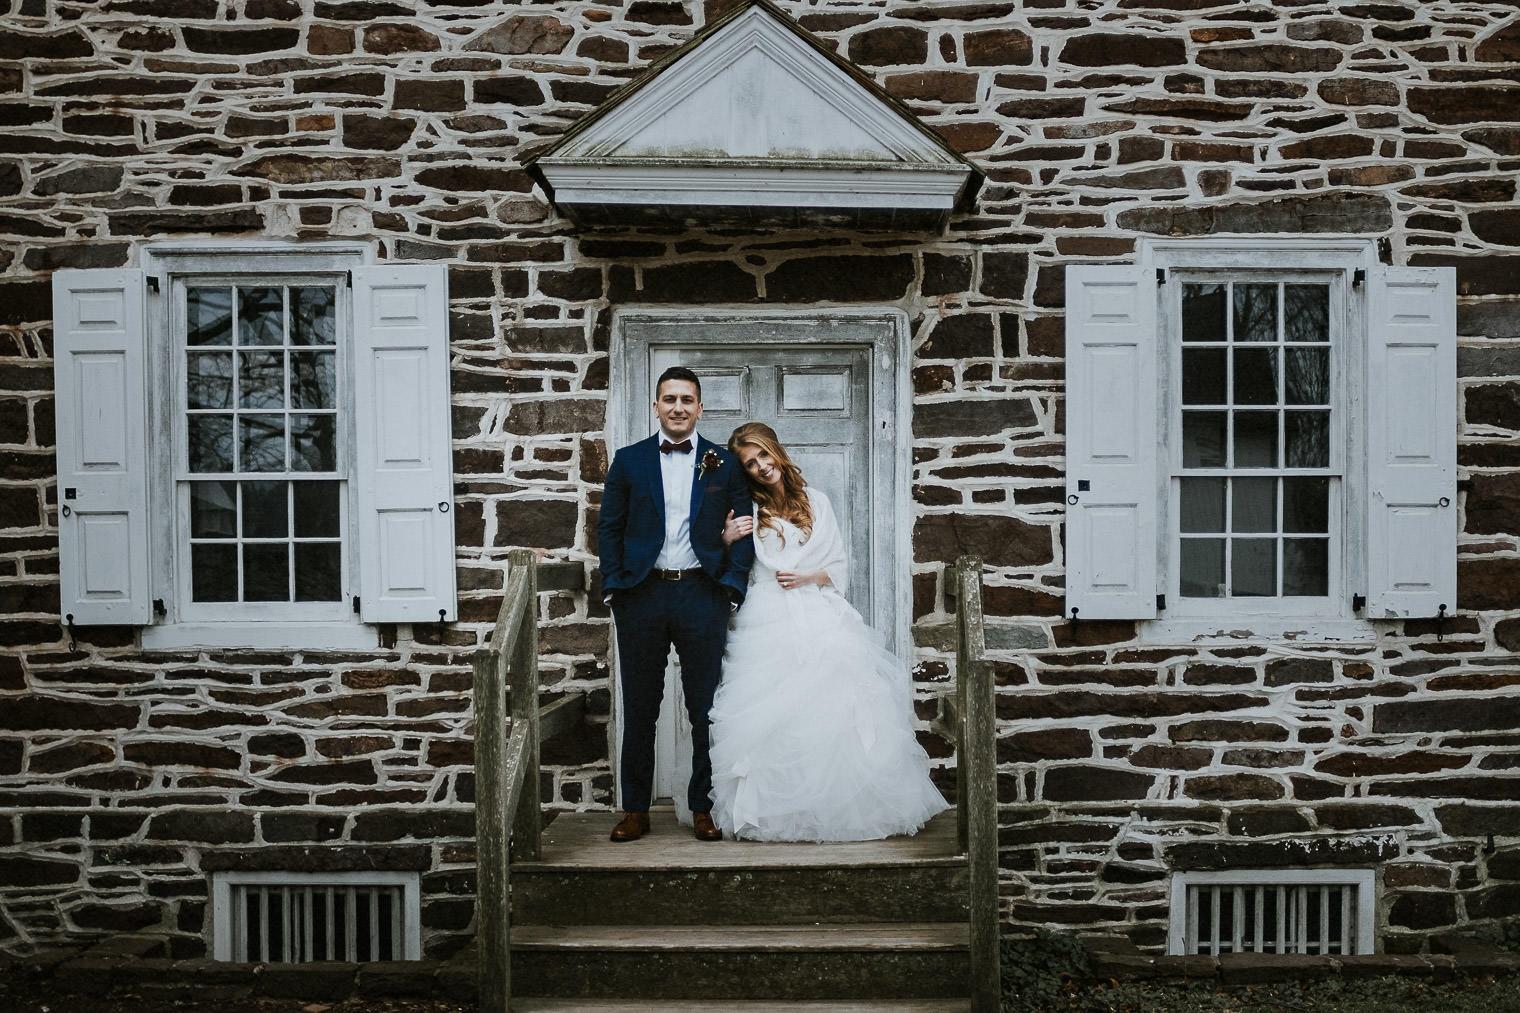 Jay-Cassario-Leica-Wedding-27.jpg